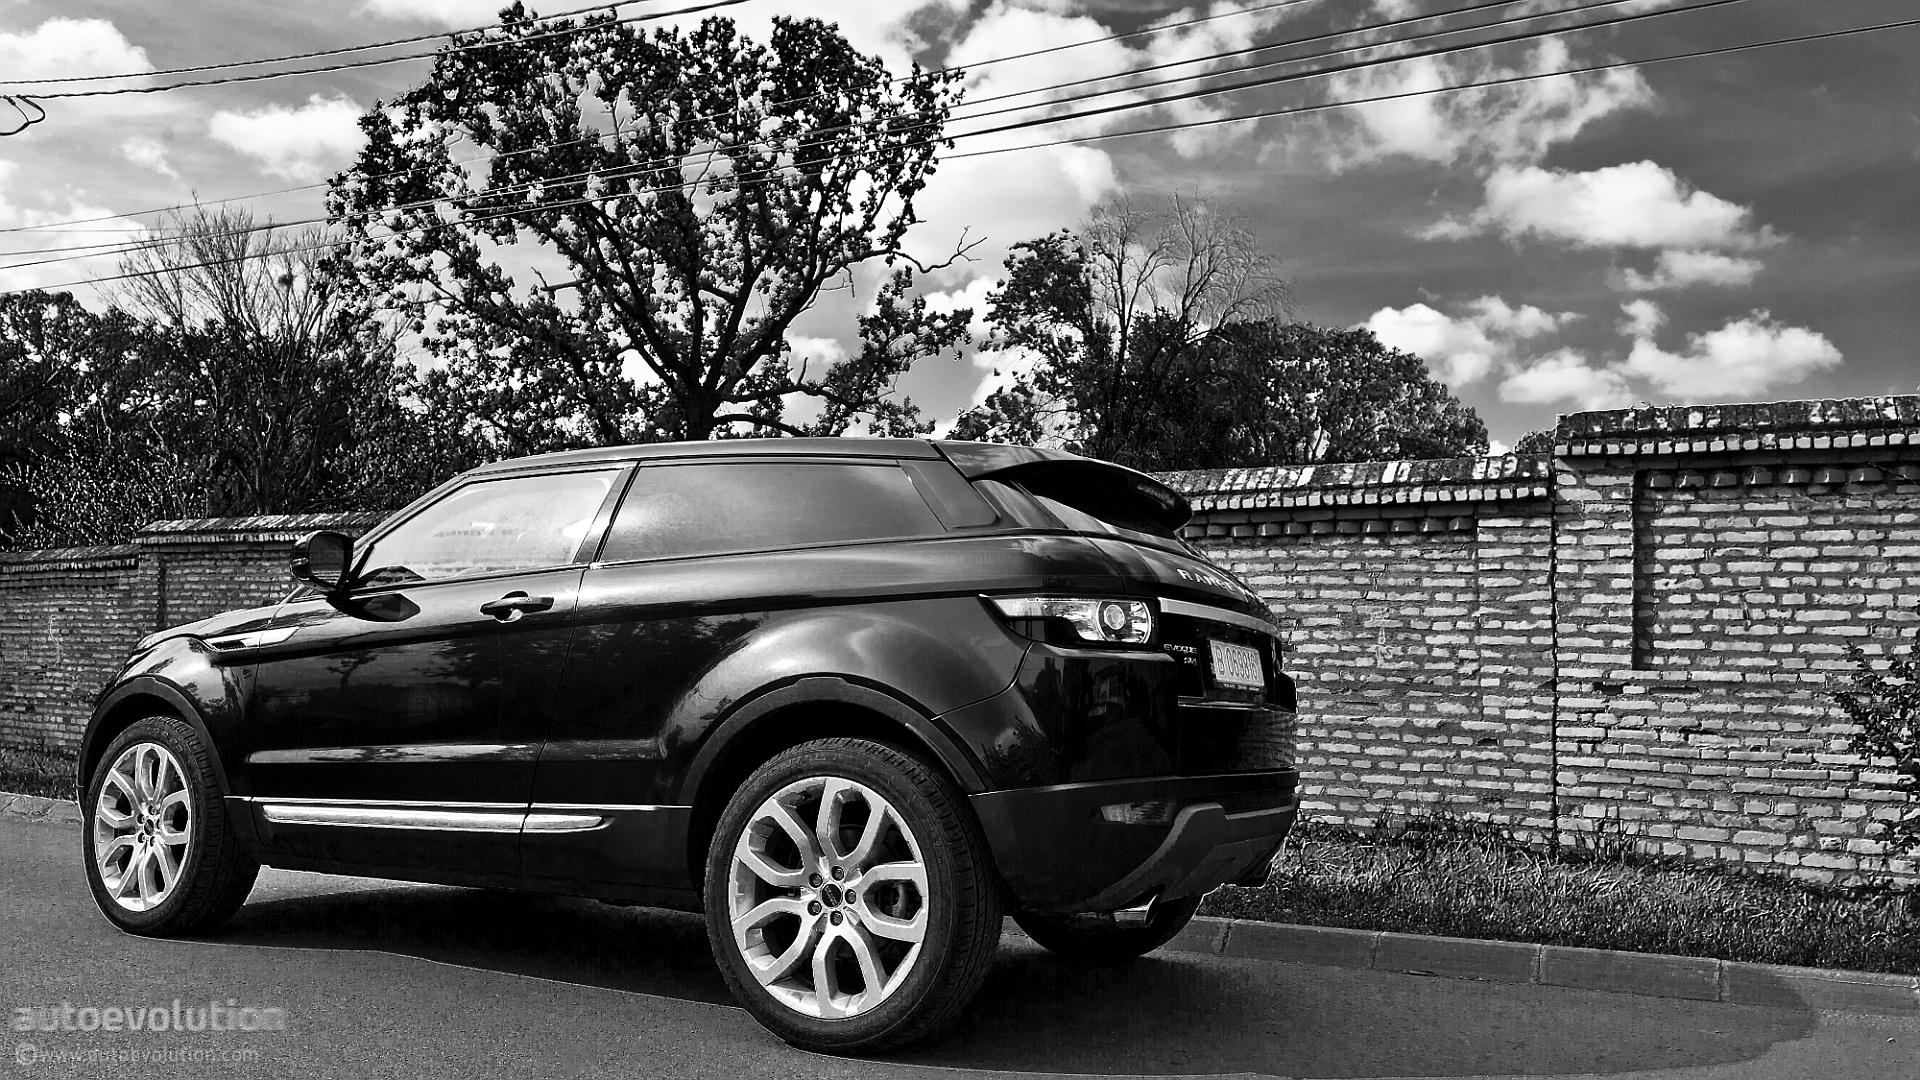 2013 land rover range rover test drive luxury suv video. Black Bedroom Furniture Sets. Home Design Ideas